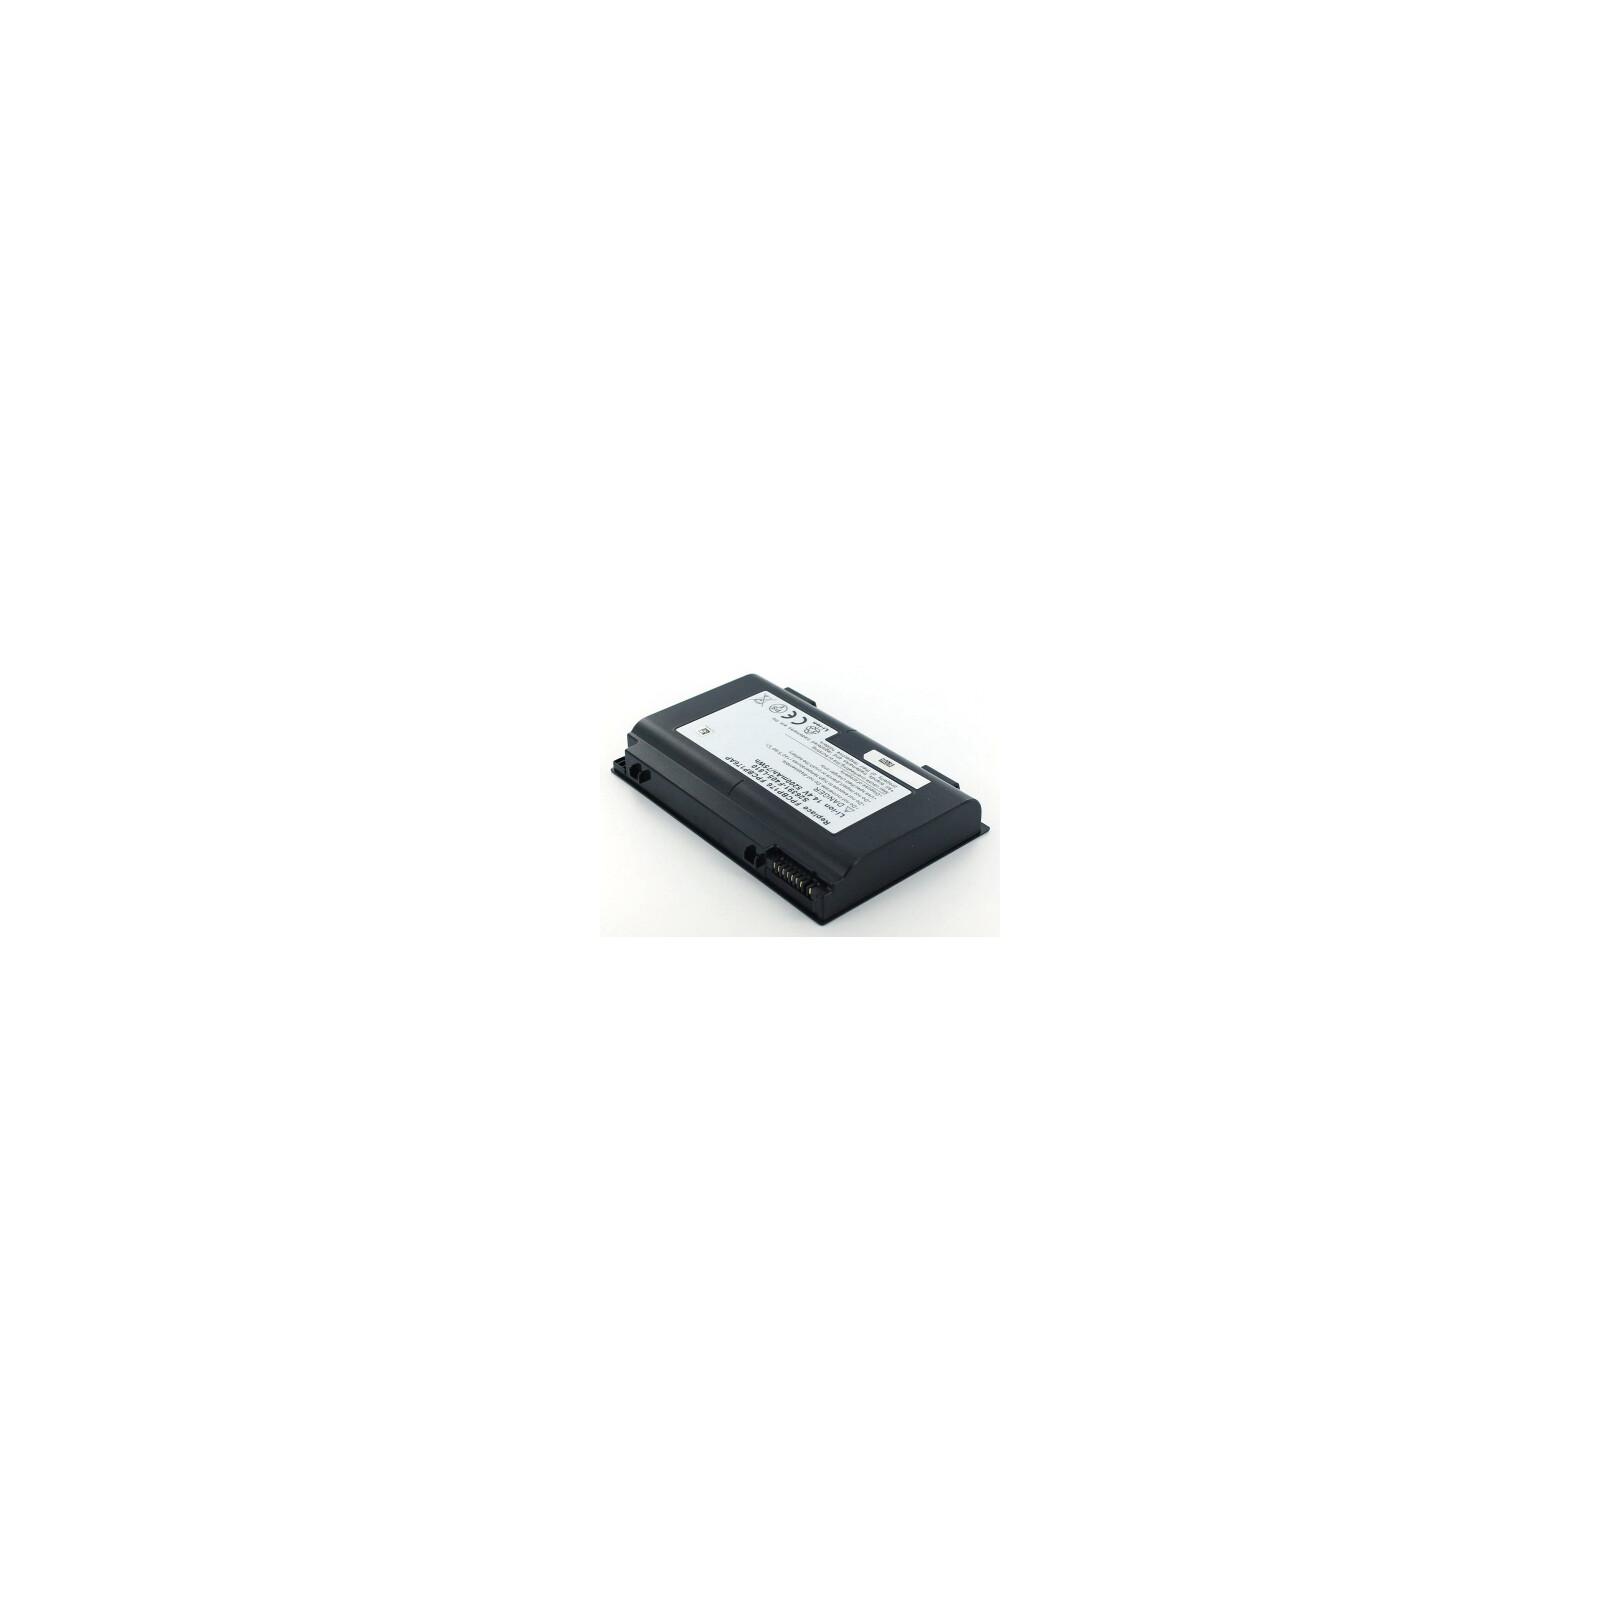 AGI Akku Fujitsu Siemens CP335317-01